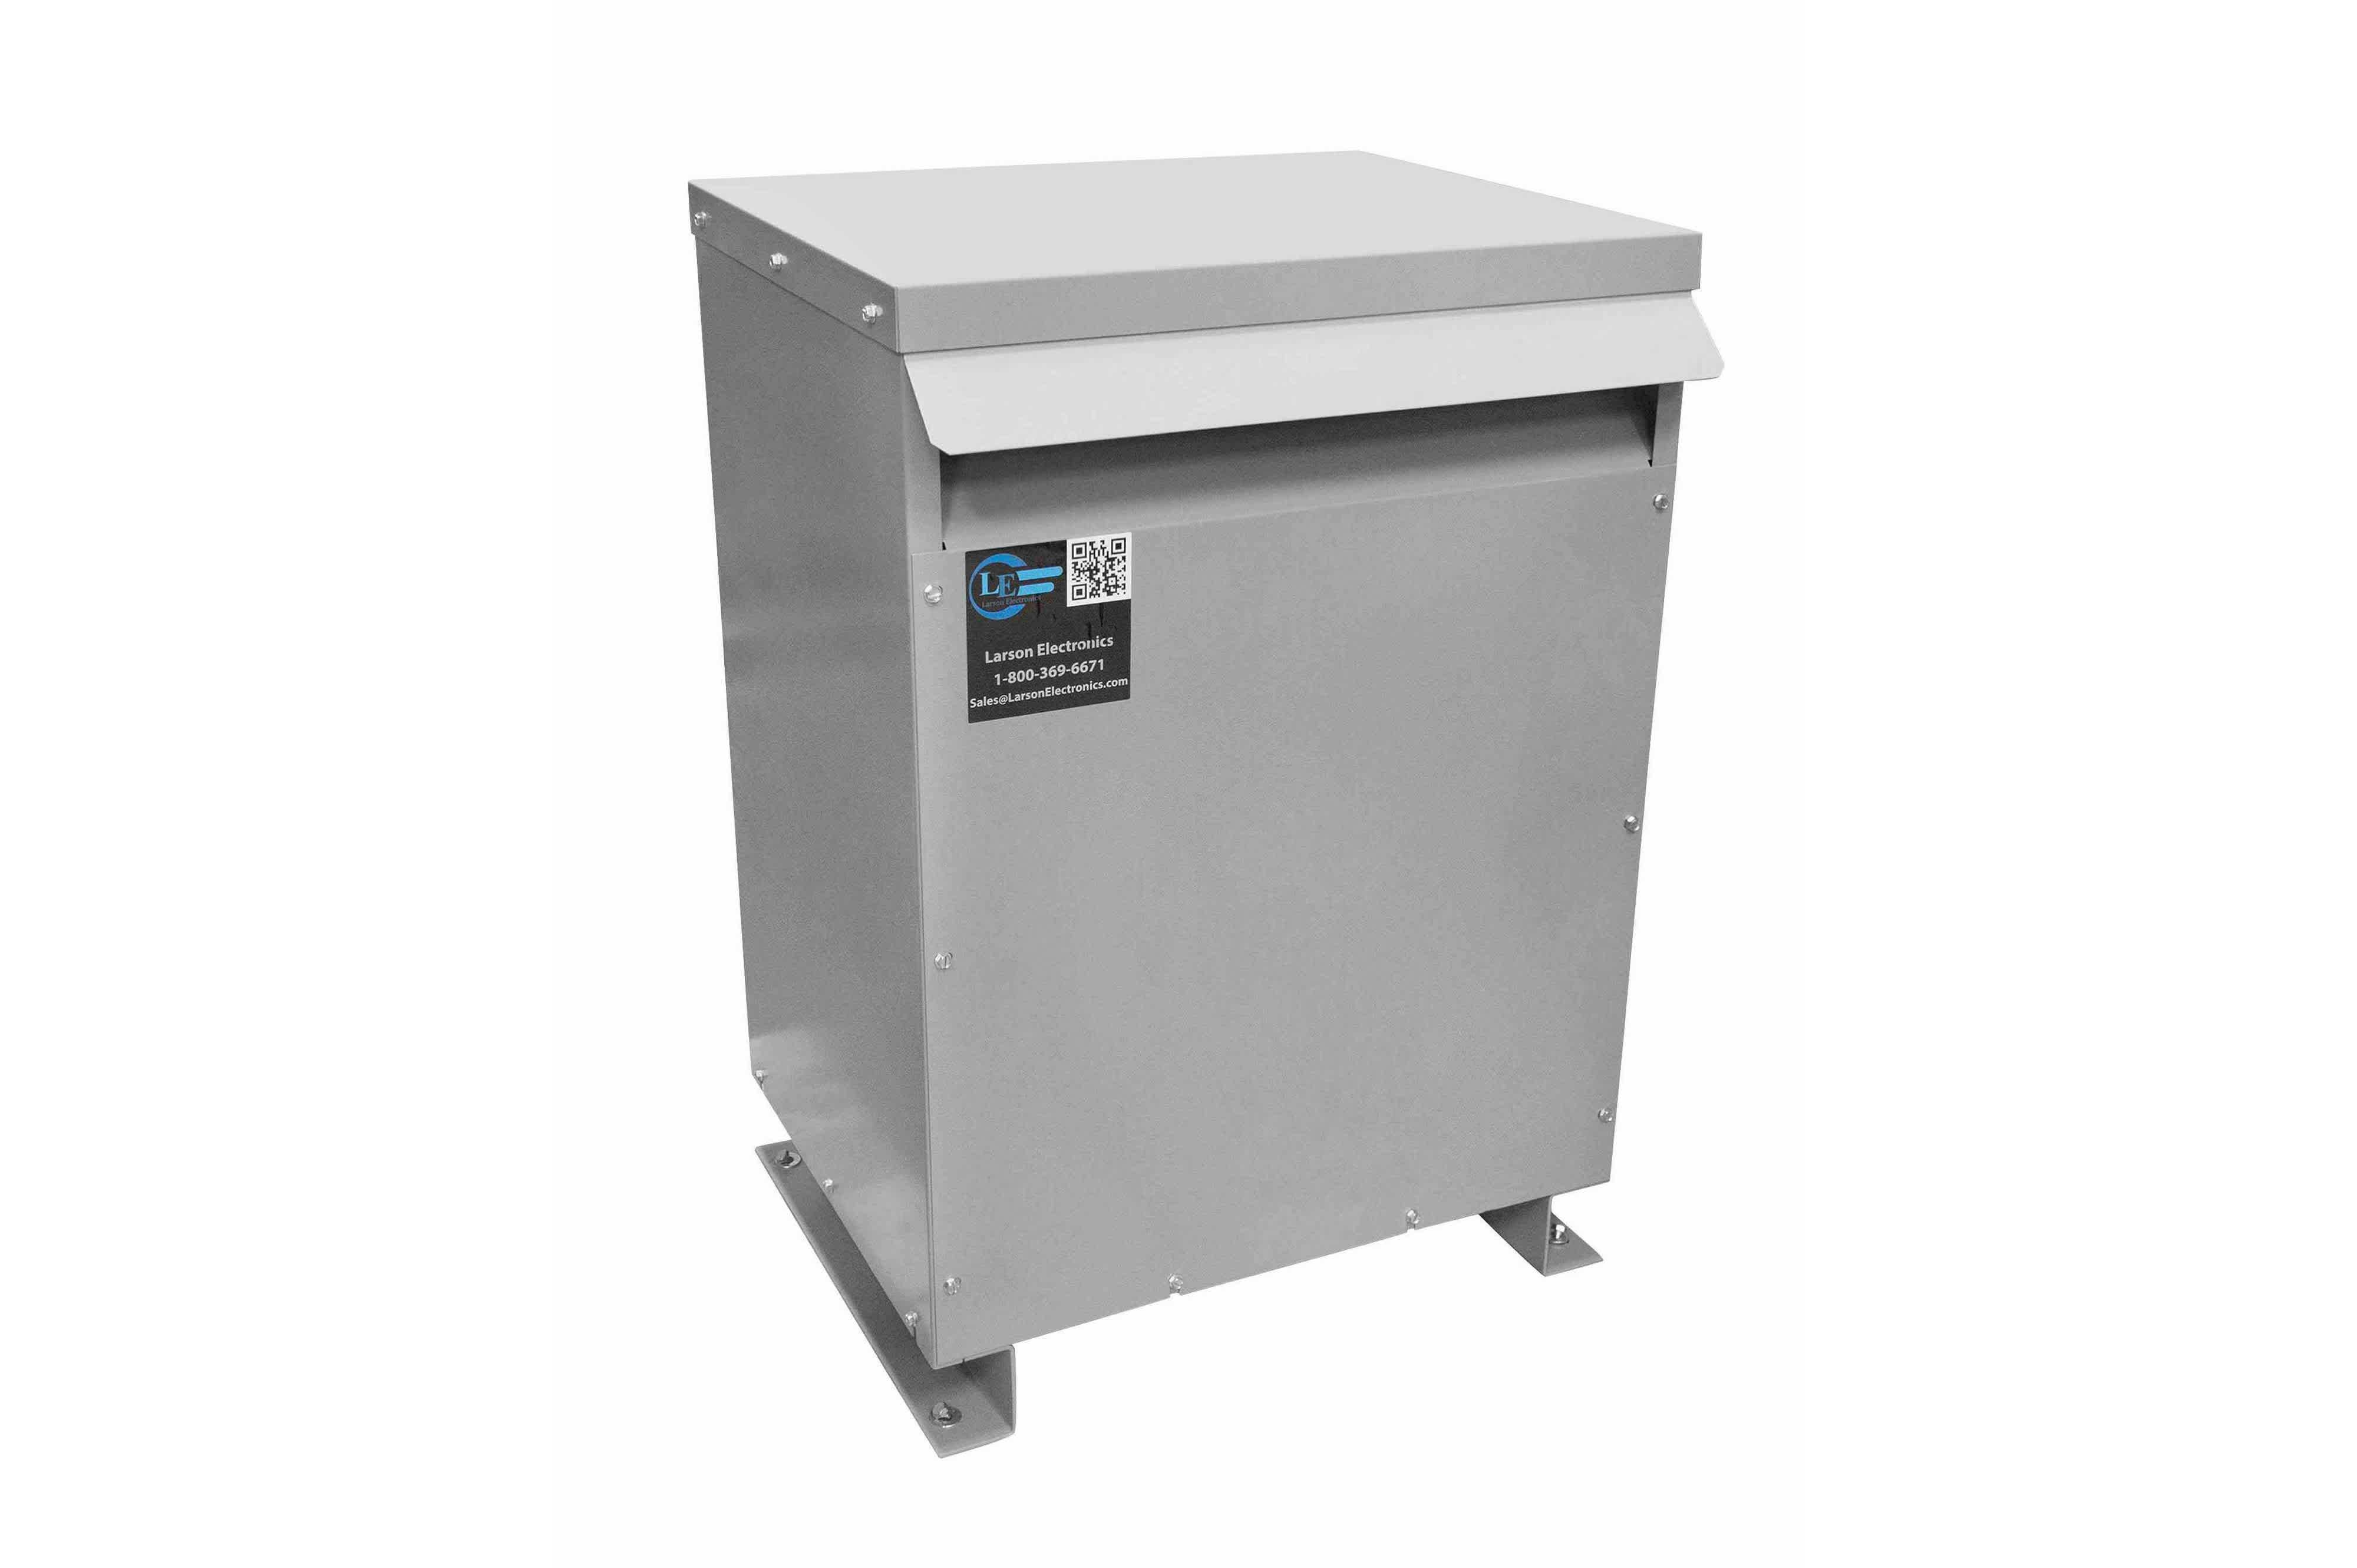 700 kVA 3PH Isolation Transformer, 600V Wye Primary, 240V/120 Delta Secondary, N3R, Ventilated, 60 Hz